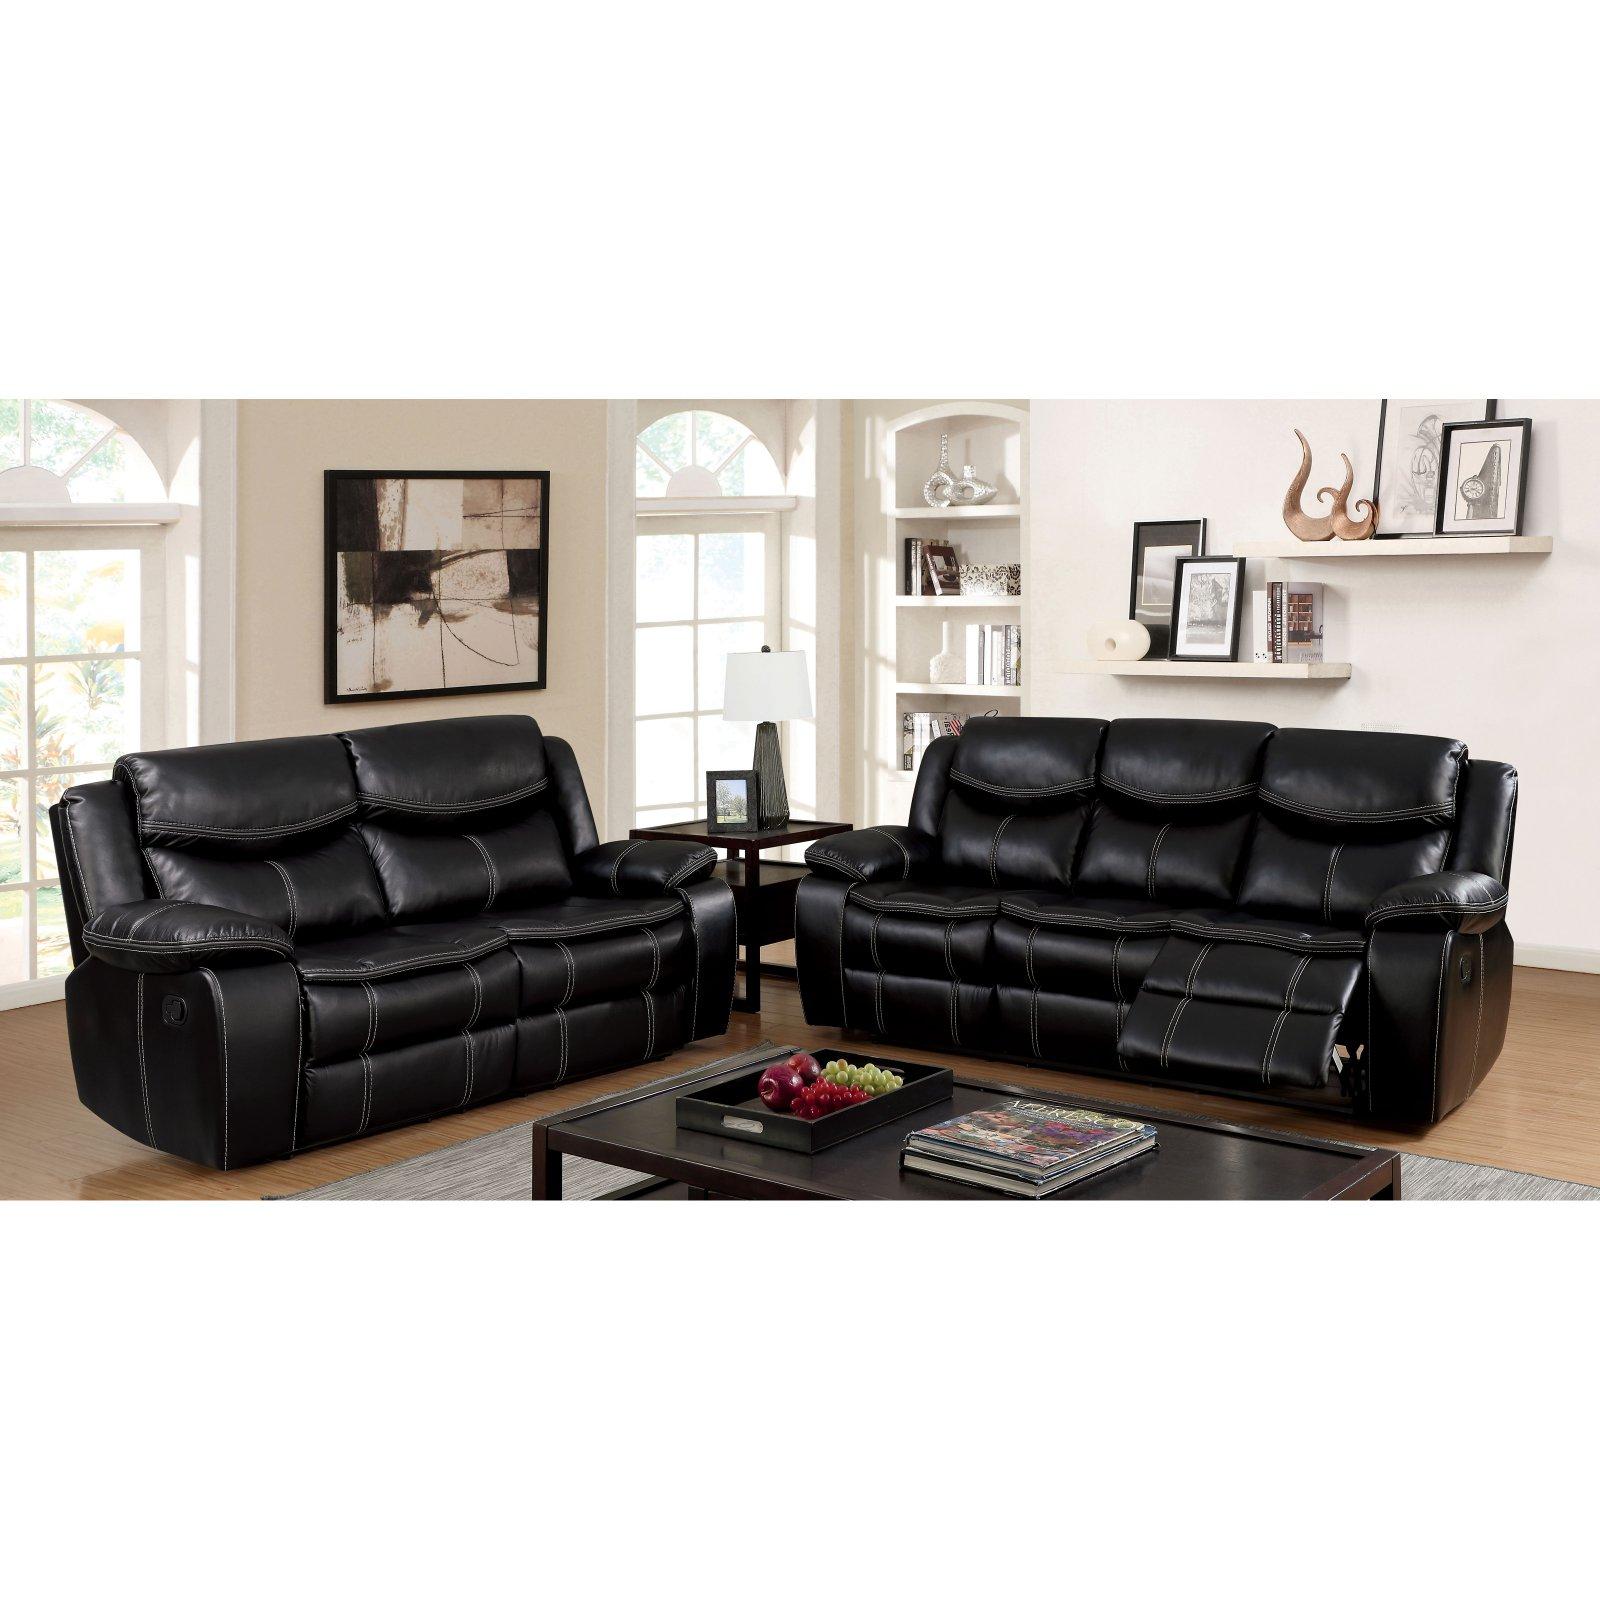 Furniture of America Siekka Transitional Style Leatherette Recliner Loveseat